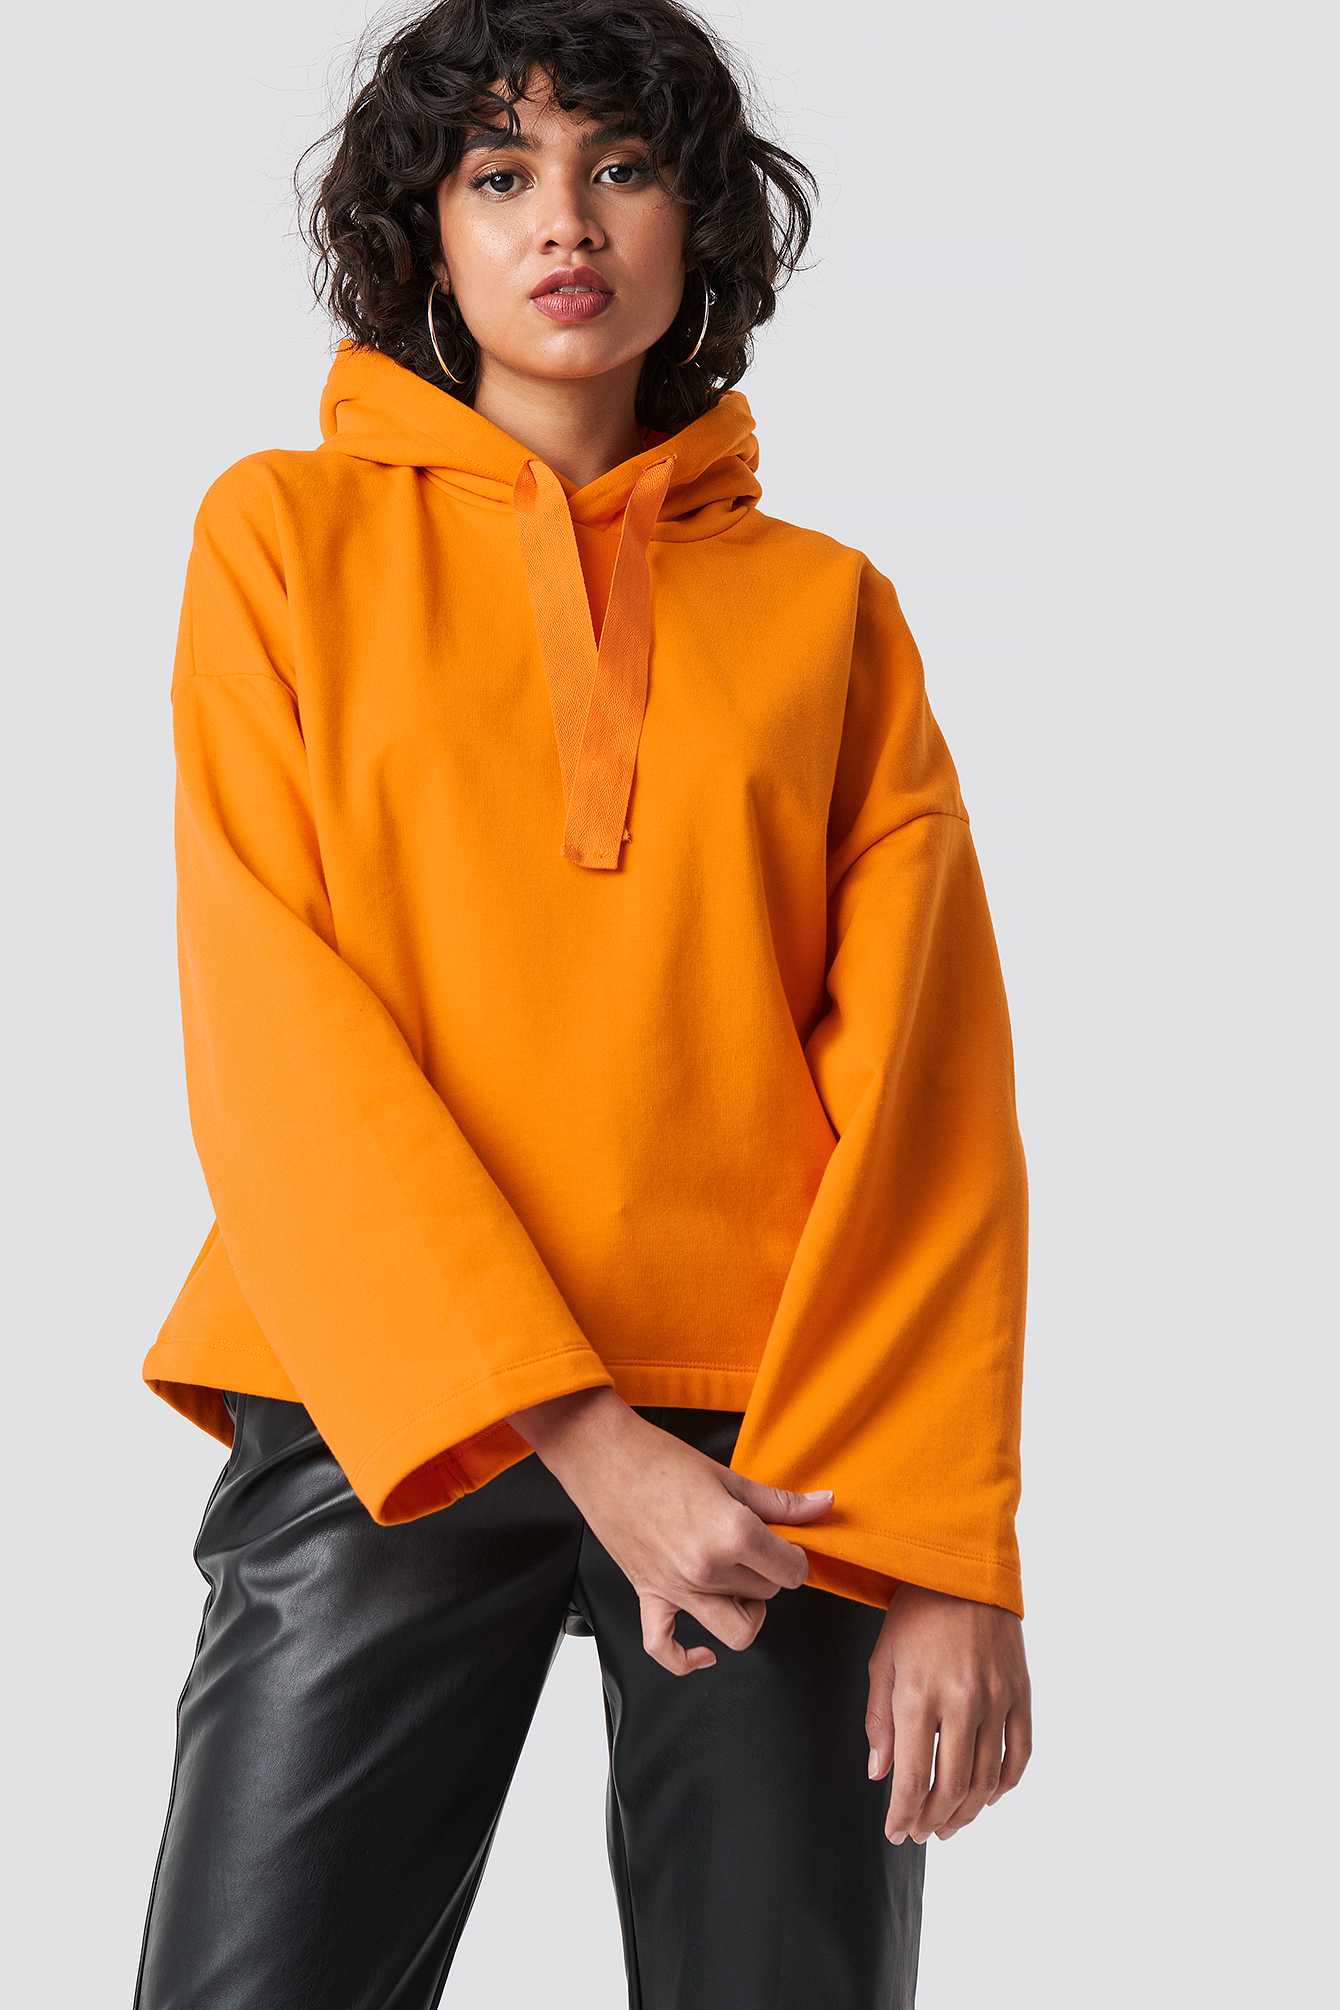 Tiala Sweatshirt NA-KD.COM